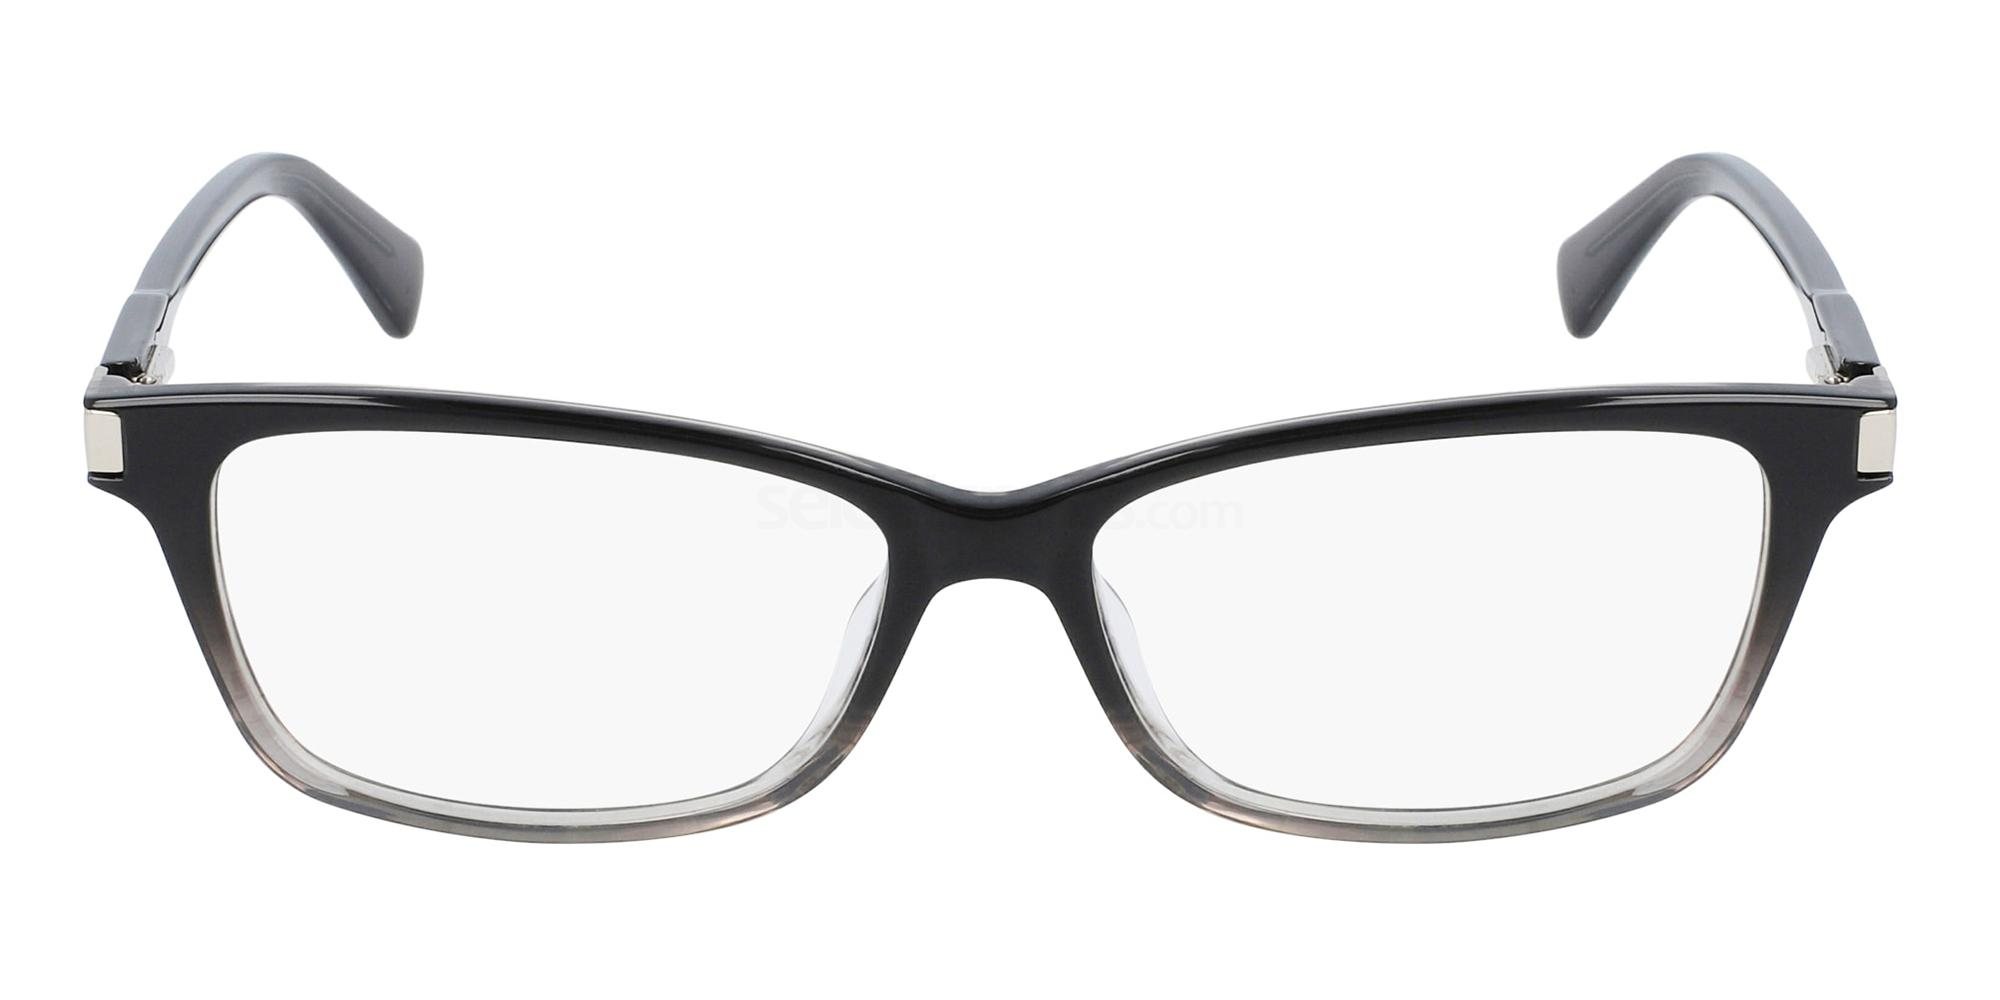 036 LO2632 Glasses, LONGCHAMP